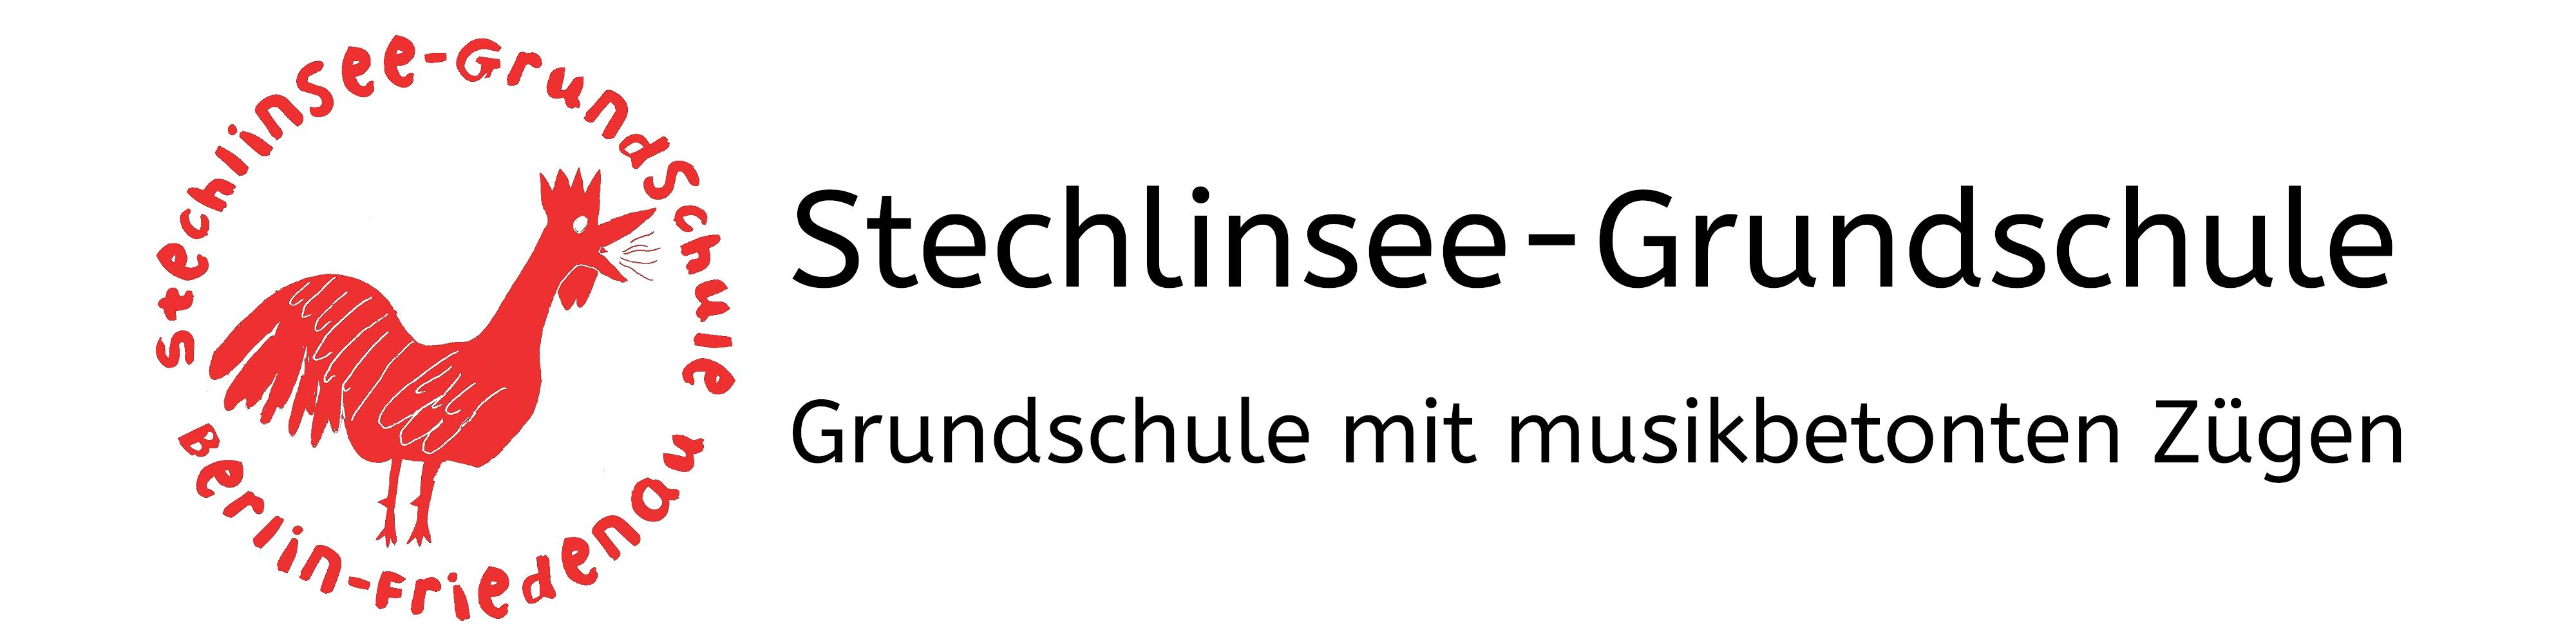 Stechlinsee-Grundschule